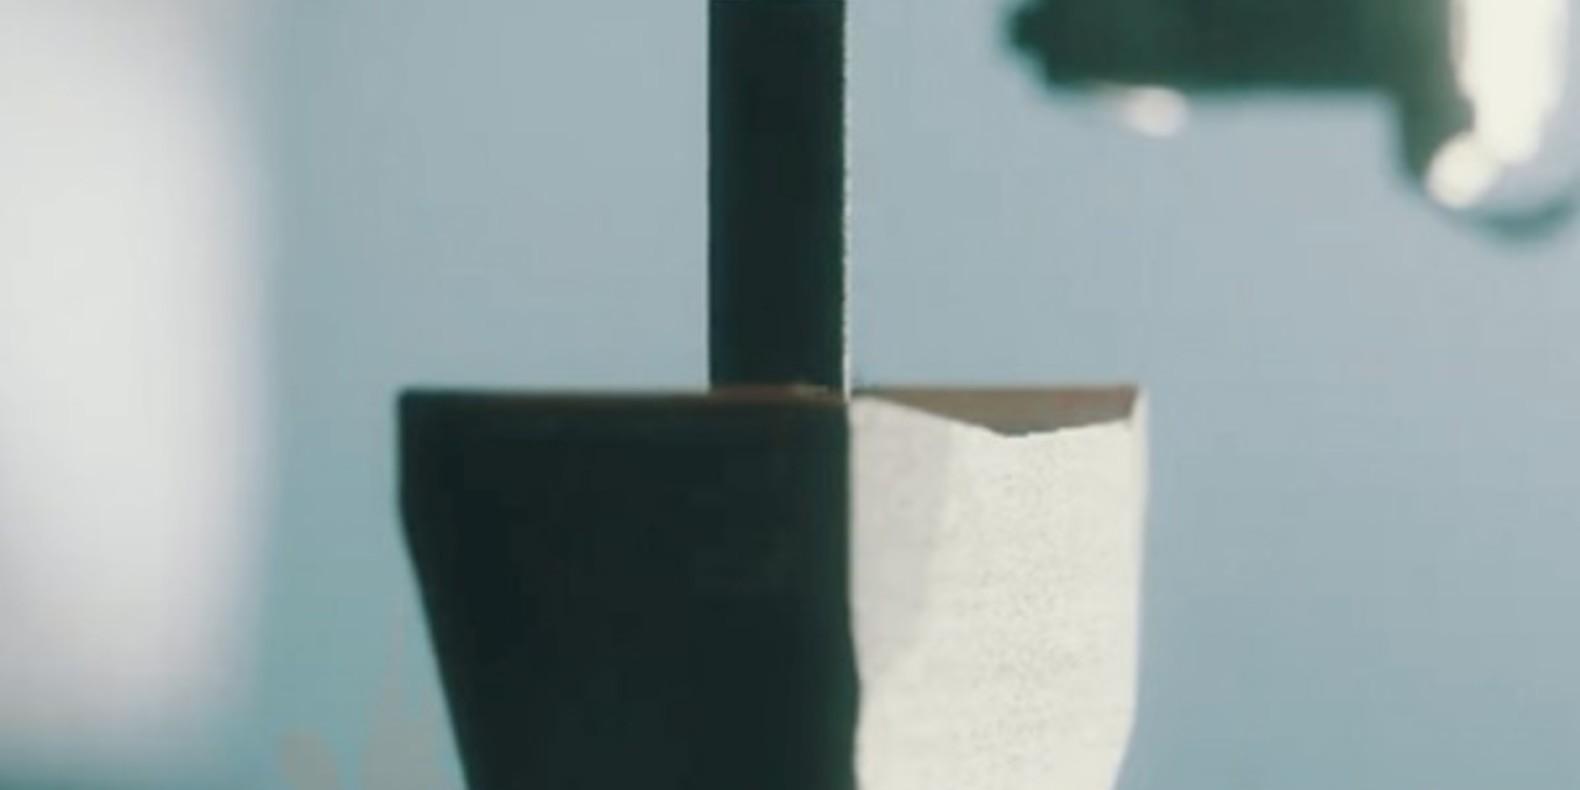 vikings-3Dbrooklyn-cults3D-fichier-3D-sword-history-5.jpg